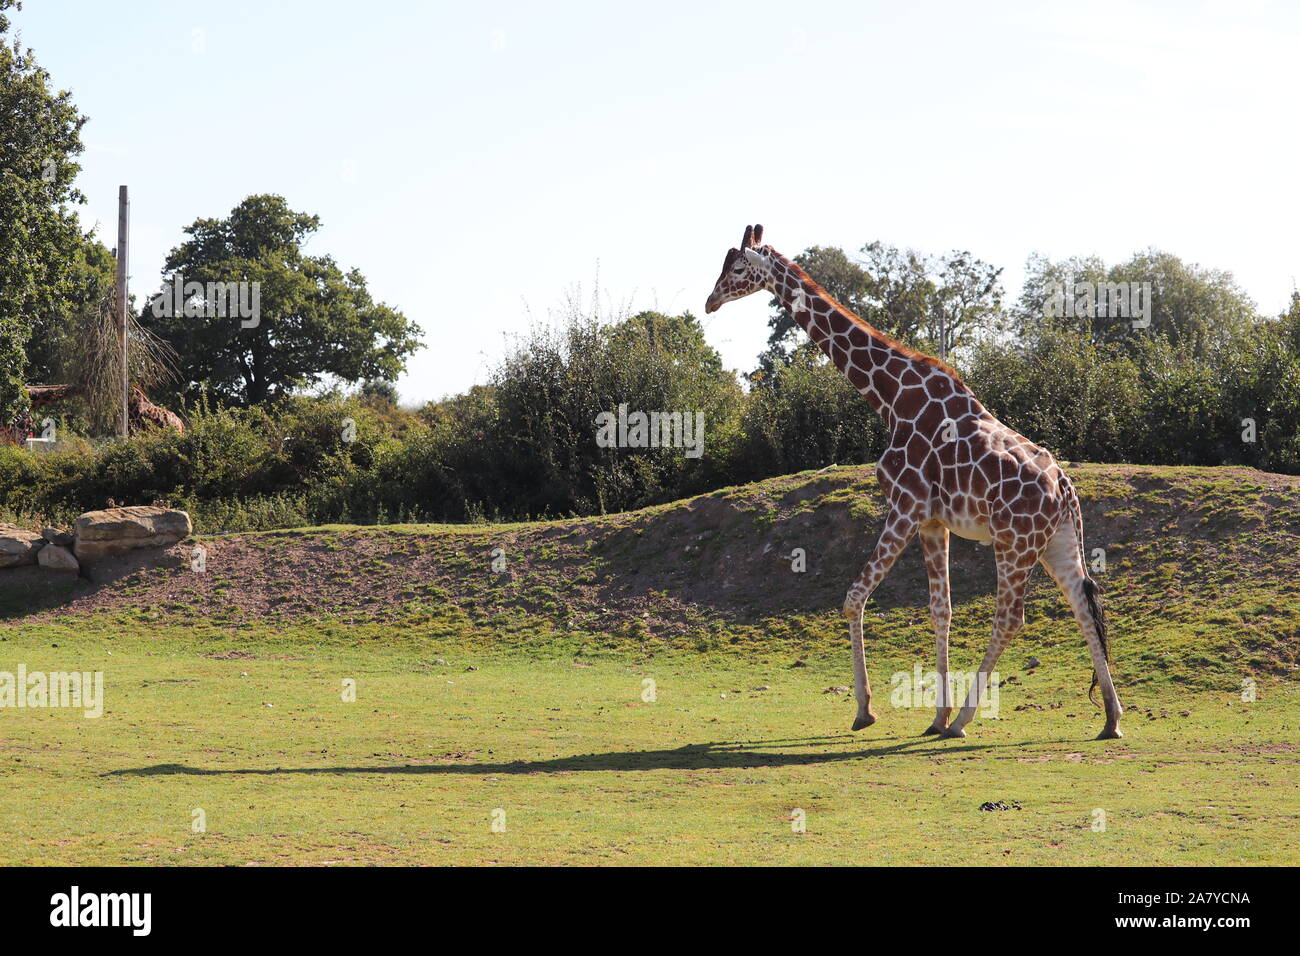 Männliche, Palle Netzgiraffe (Giraffa Camelopardalis reticulata) Stockfoto